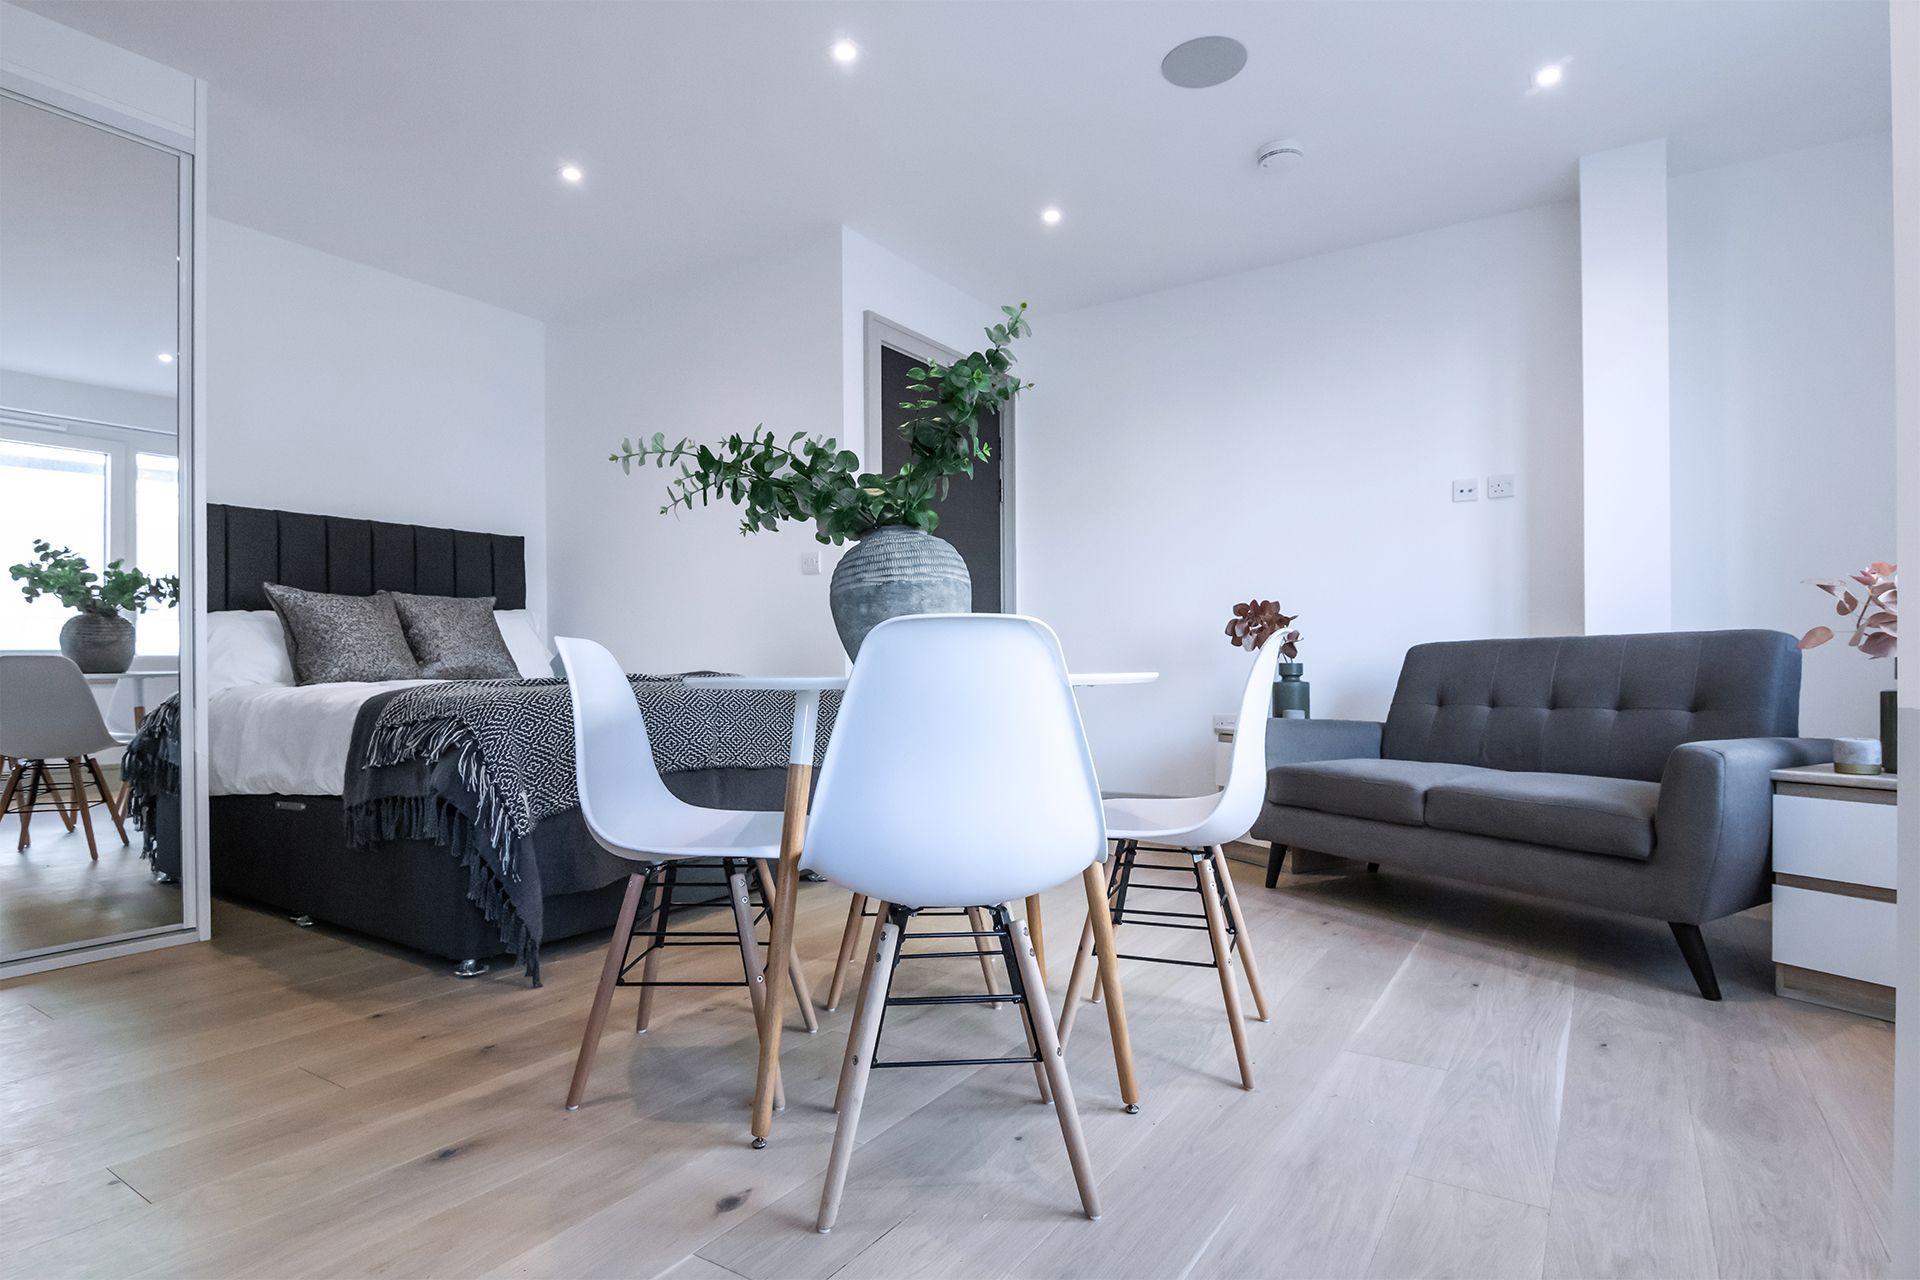 Studio apartment to rent in London FIN-KI-0004